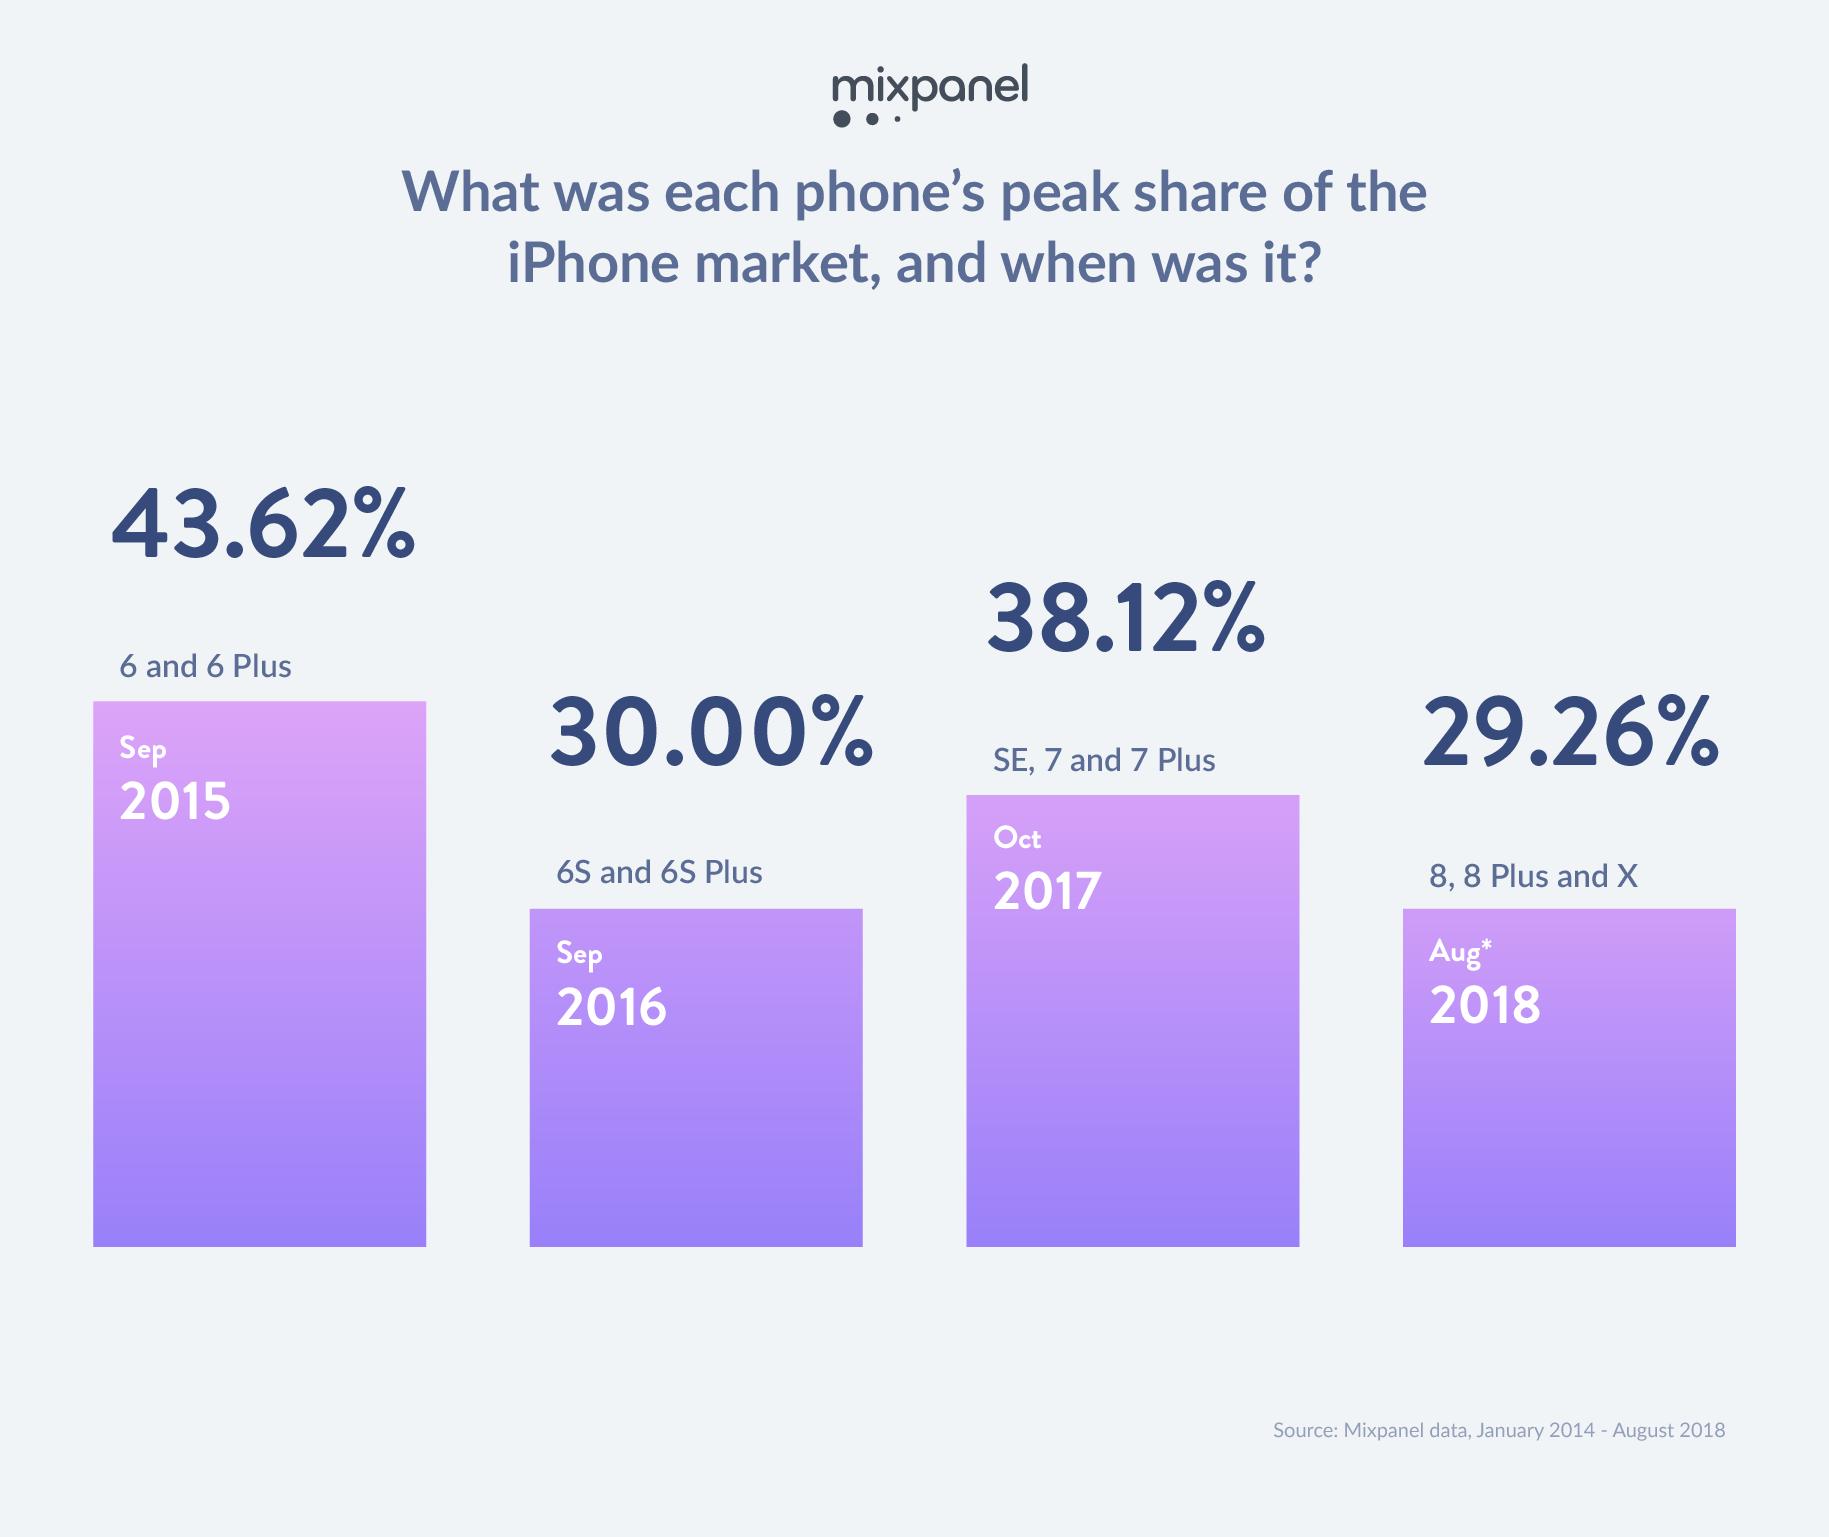 iPhone piek